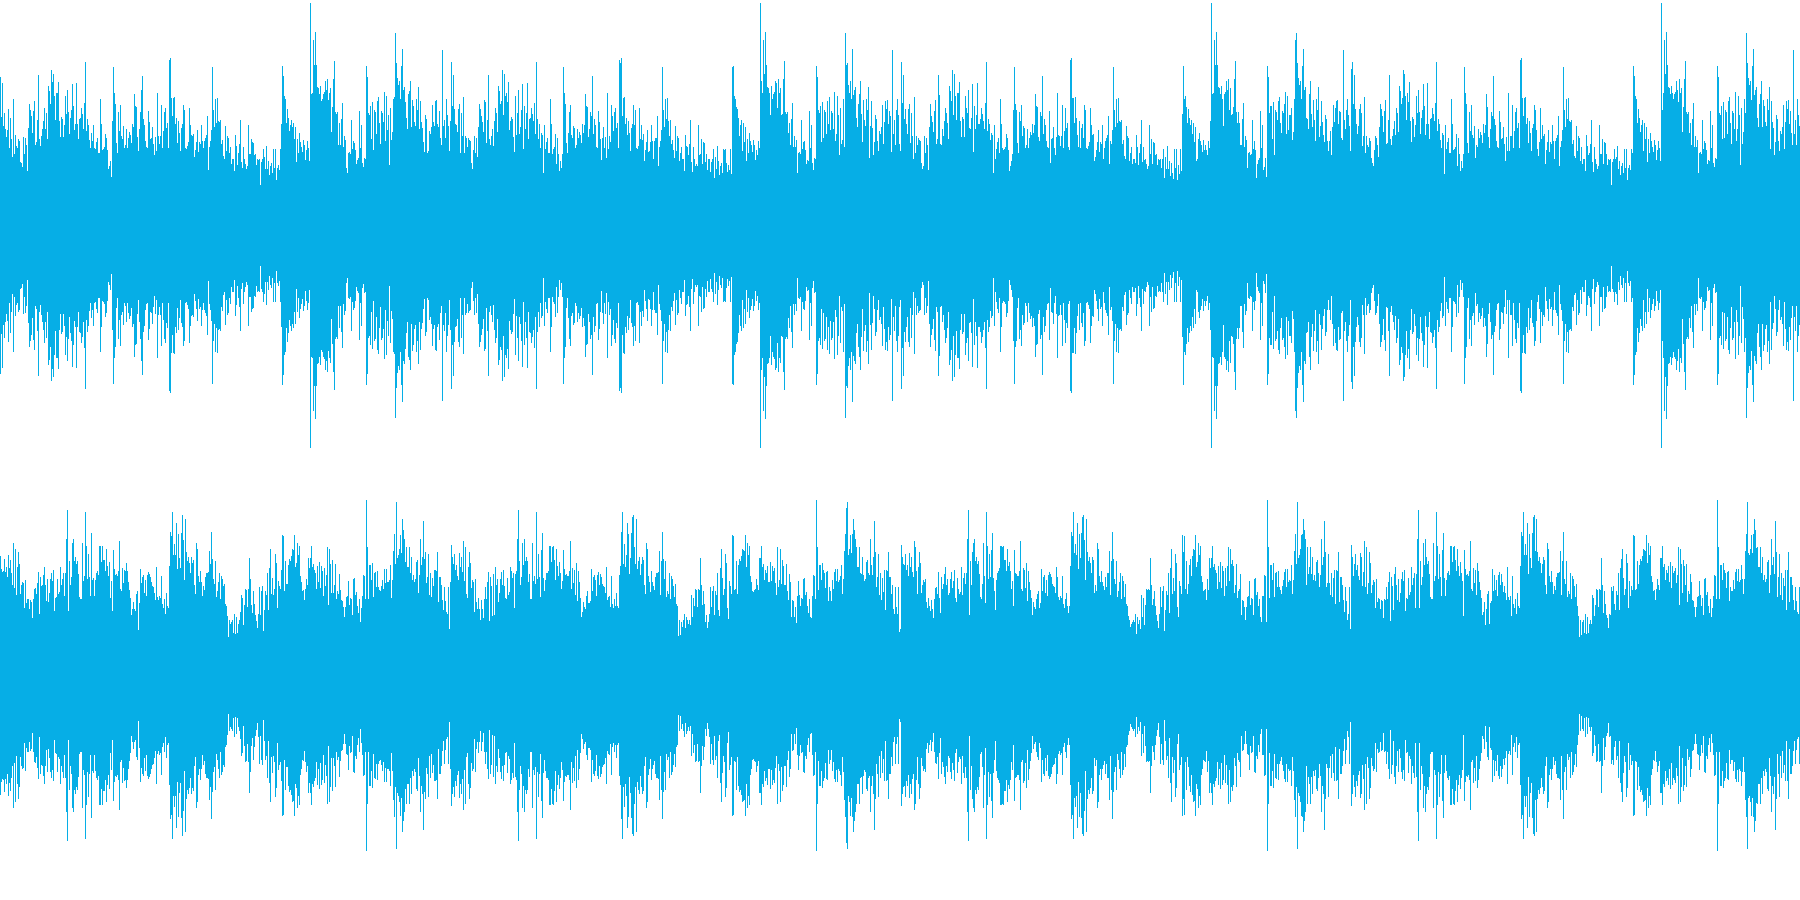 House コードシンセ 6 音楽制作用の再生済みの波形